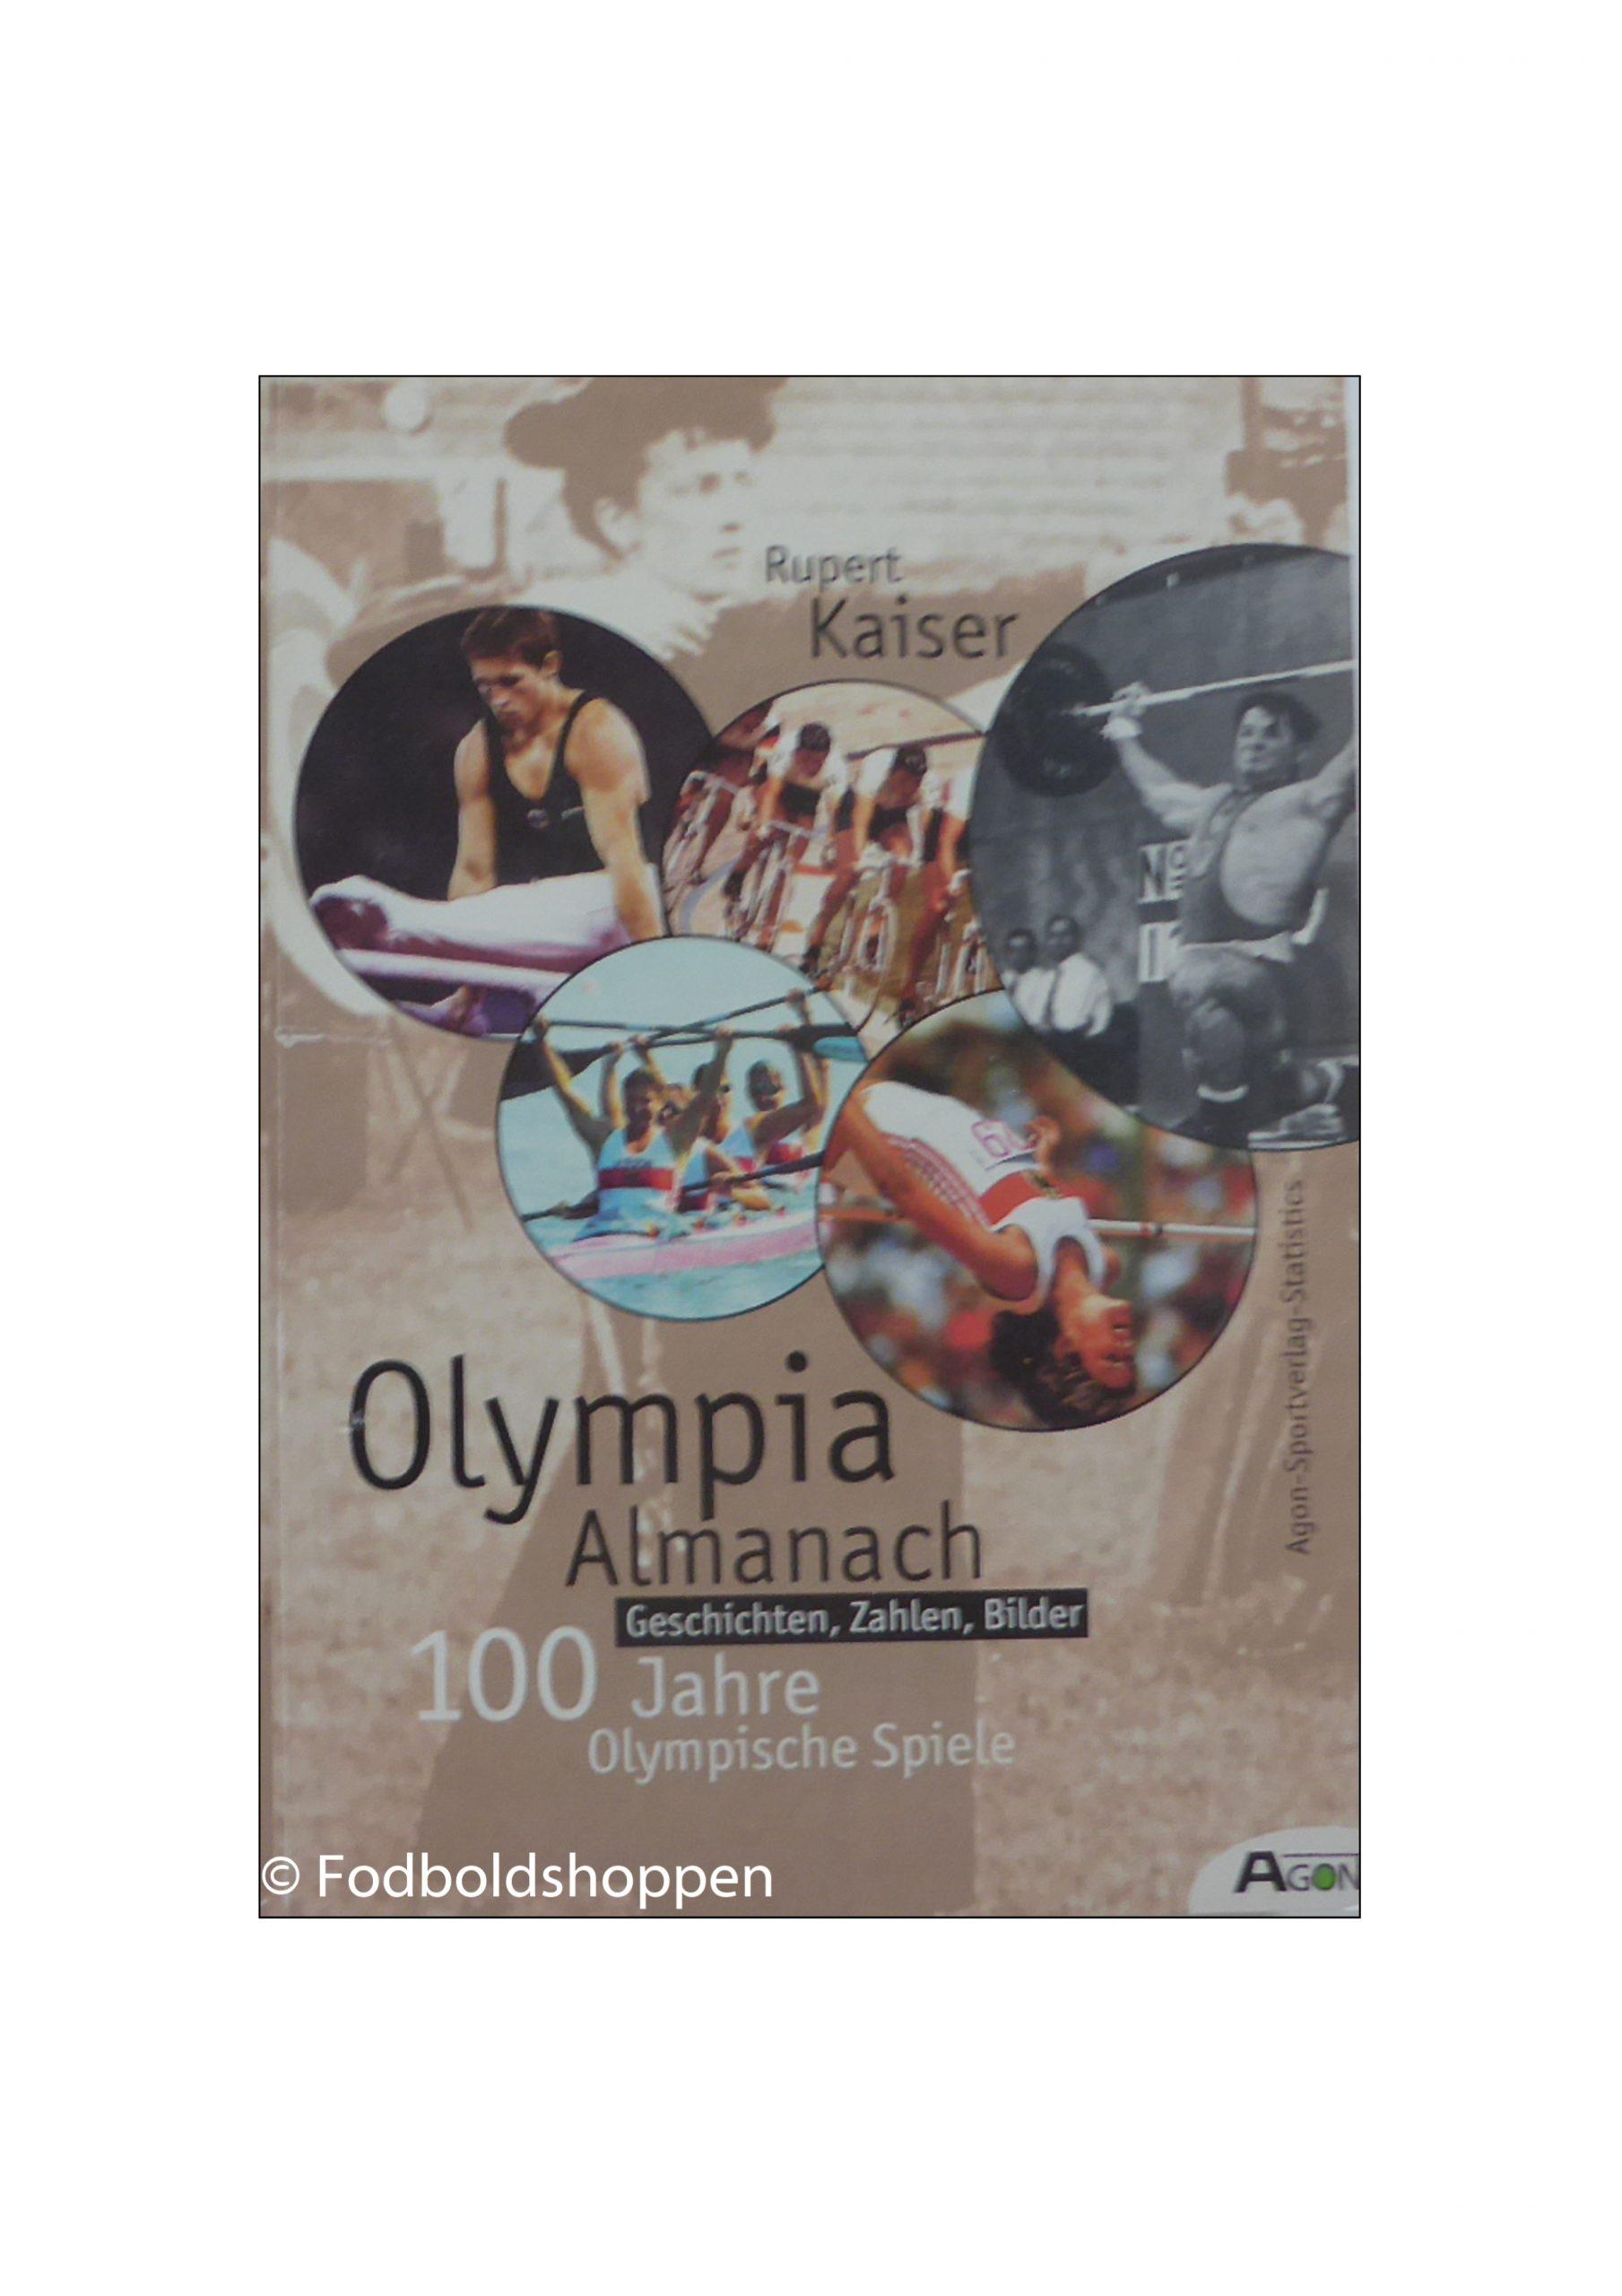 Olympia Almanach - 100 Jahre Olympische Spiele